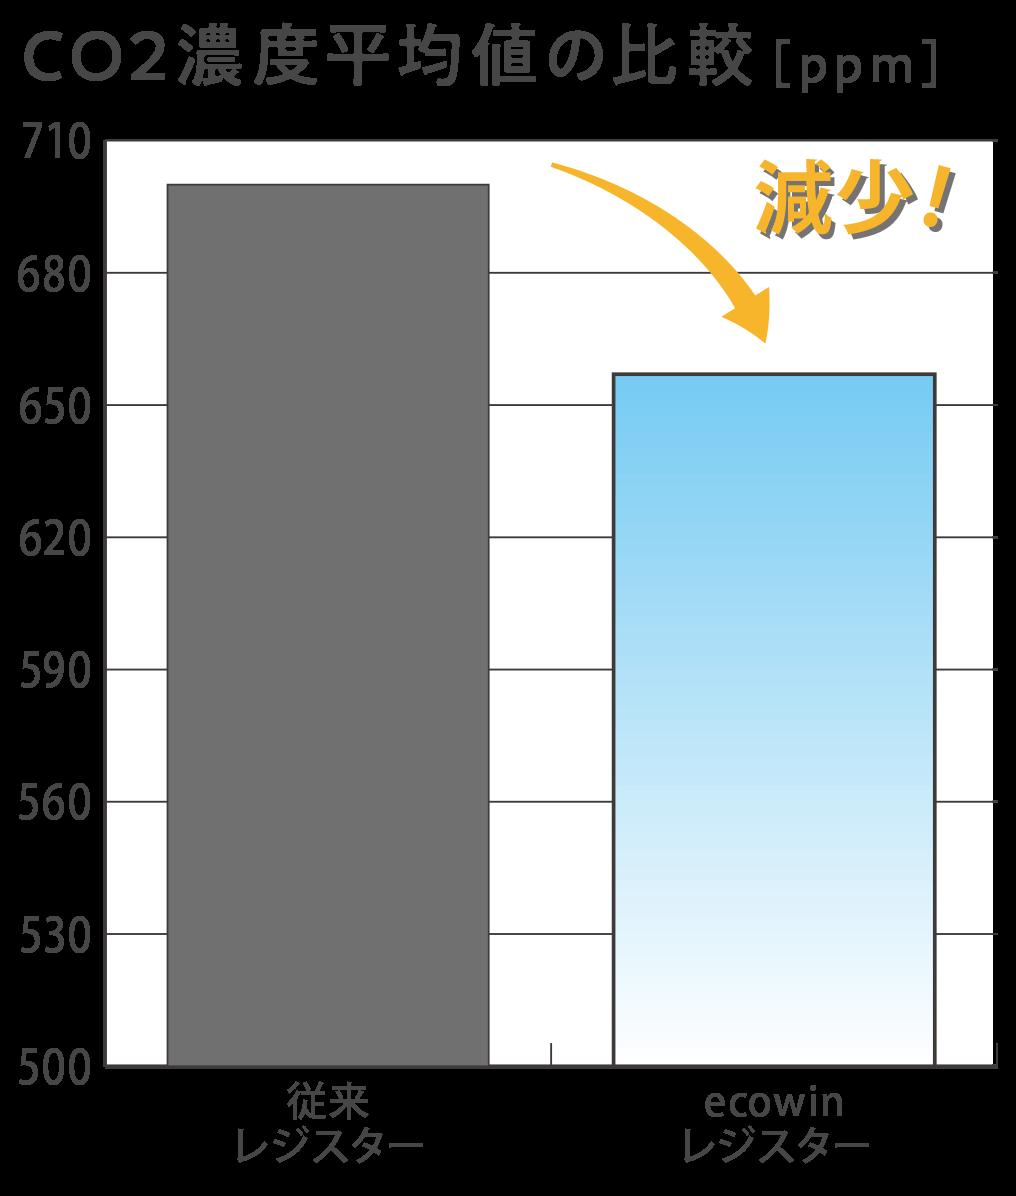 CO2濃度平均値の比較画像